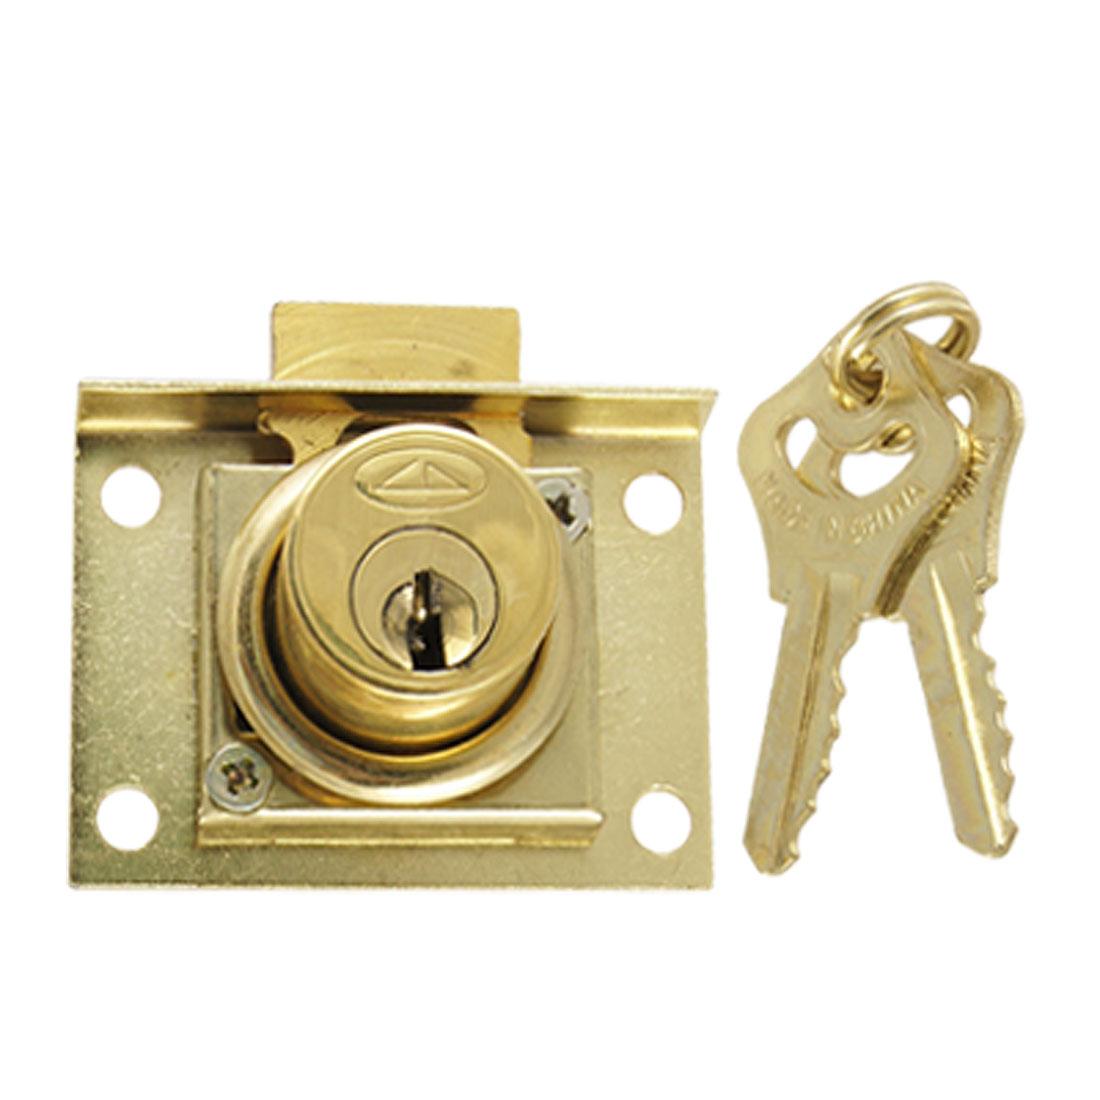 "Quarter Turn Drawer 4/5"" Diameter Cylinder Lock w Keys"